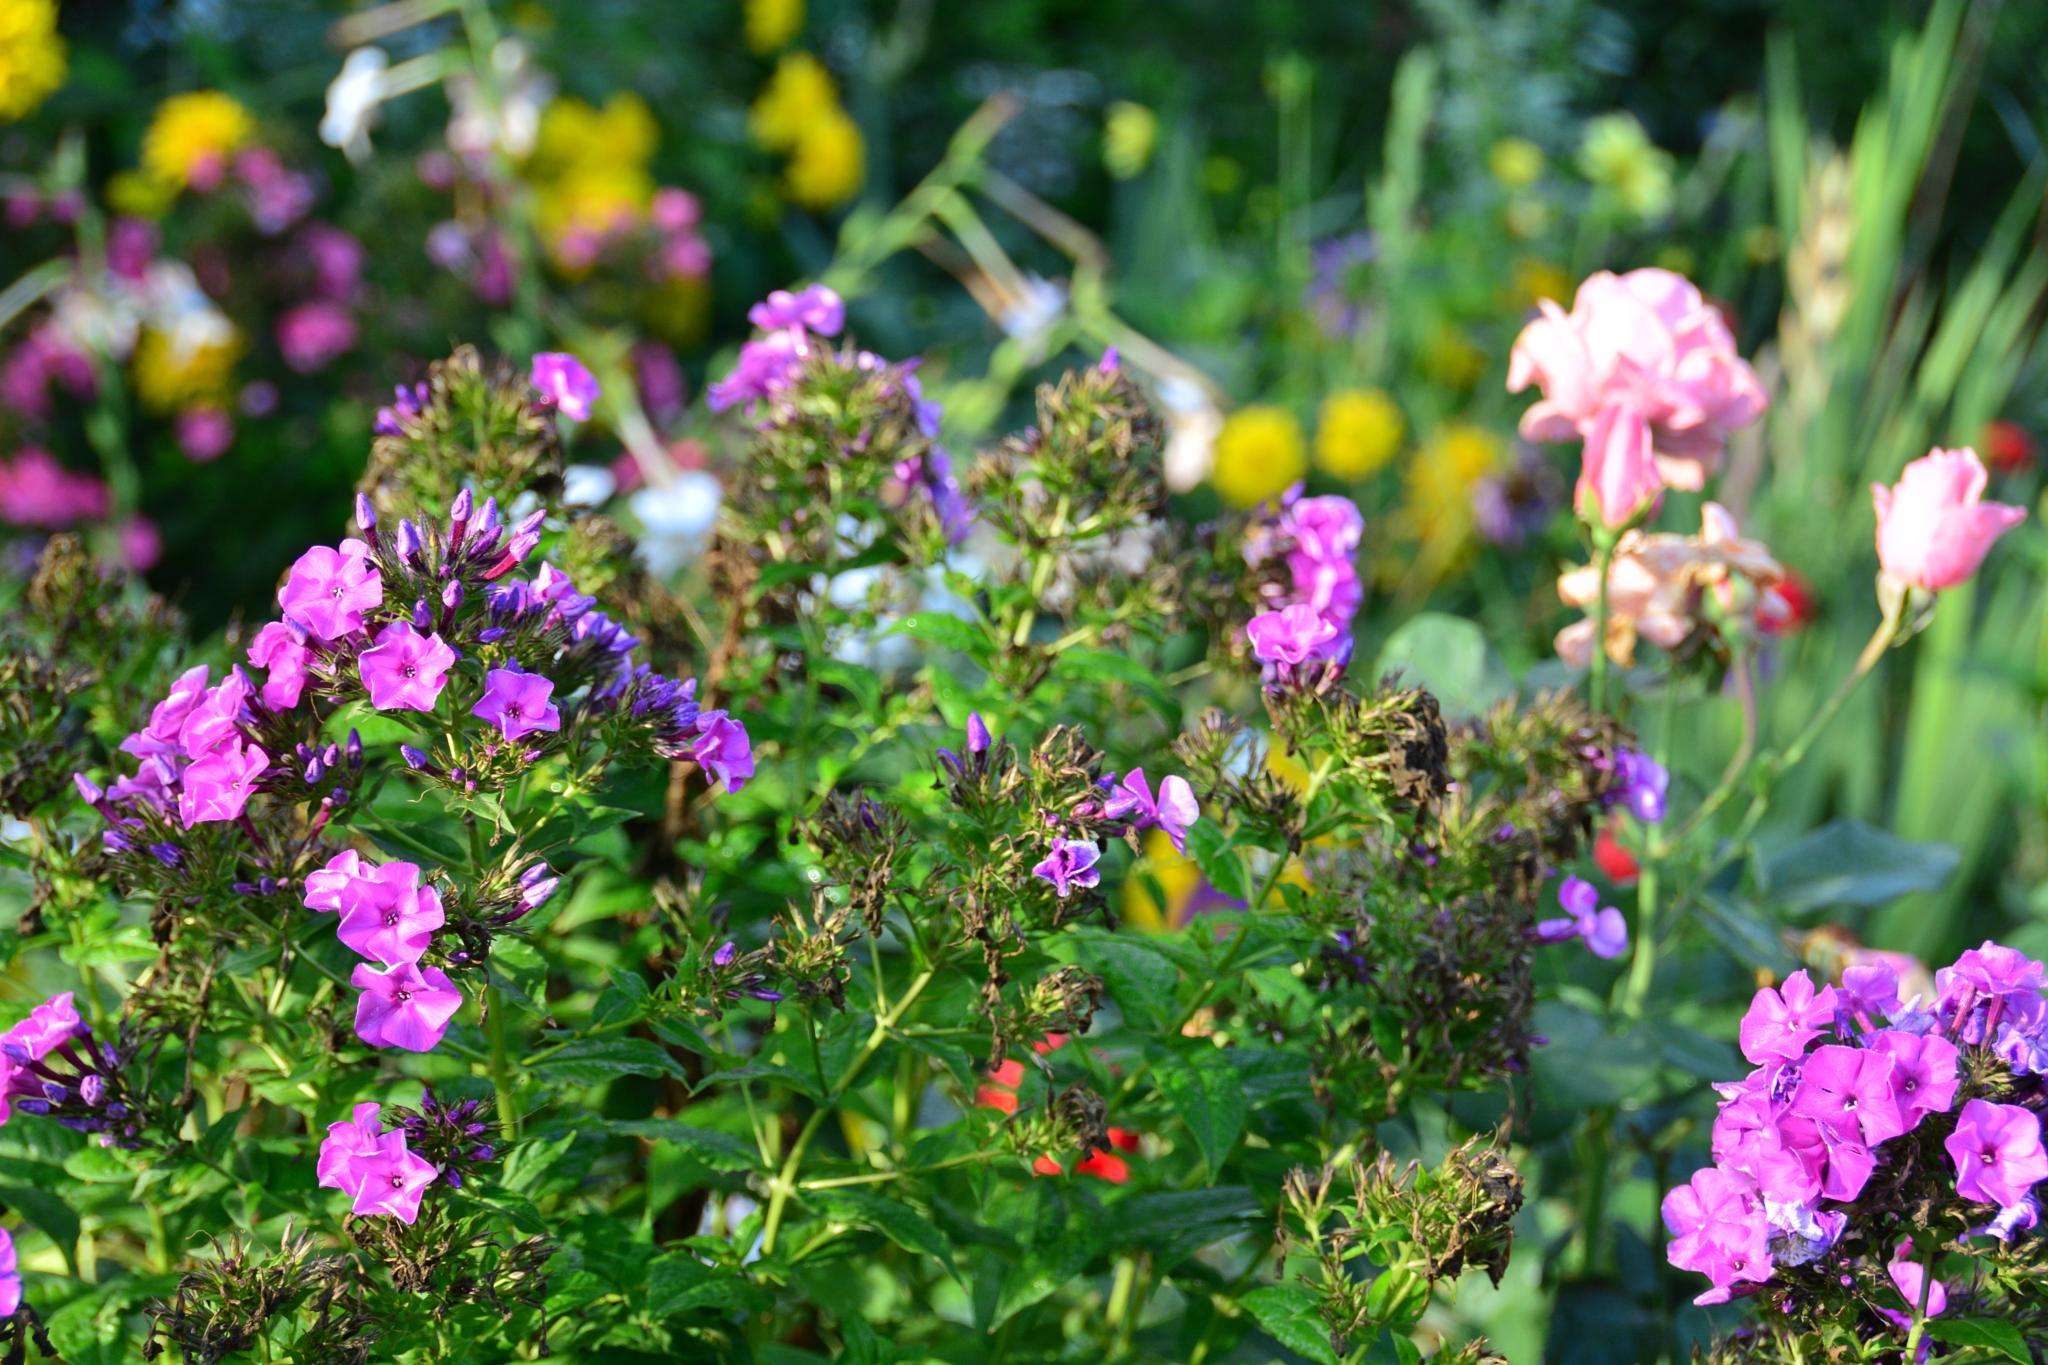 A lot of flowers by Silviu Calistru